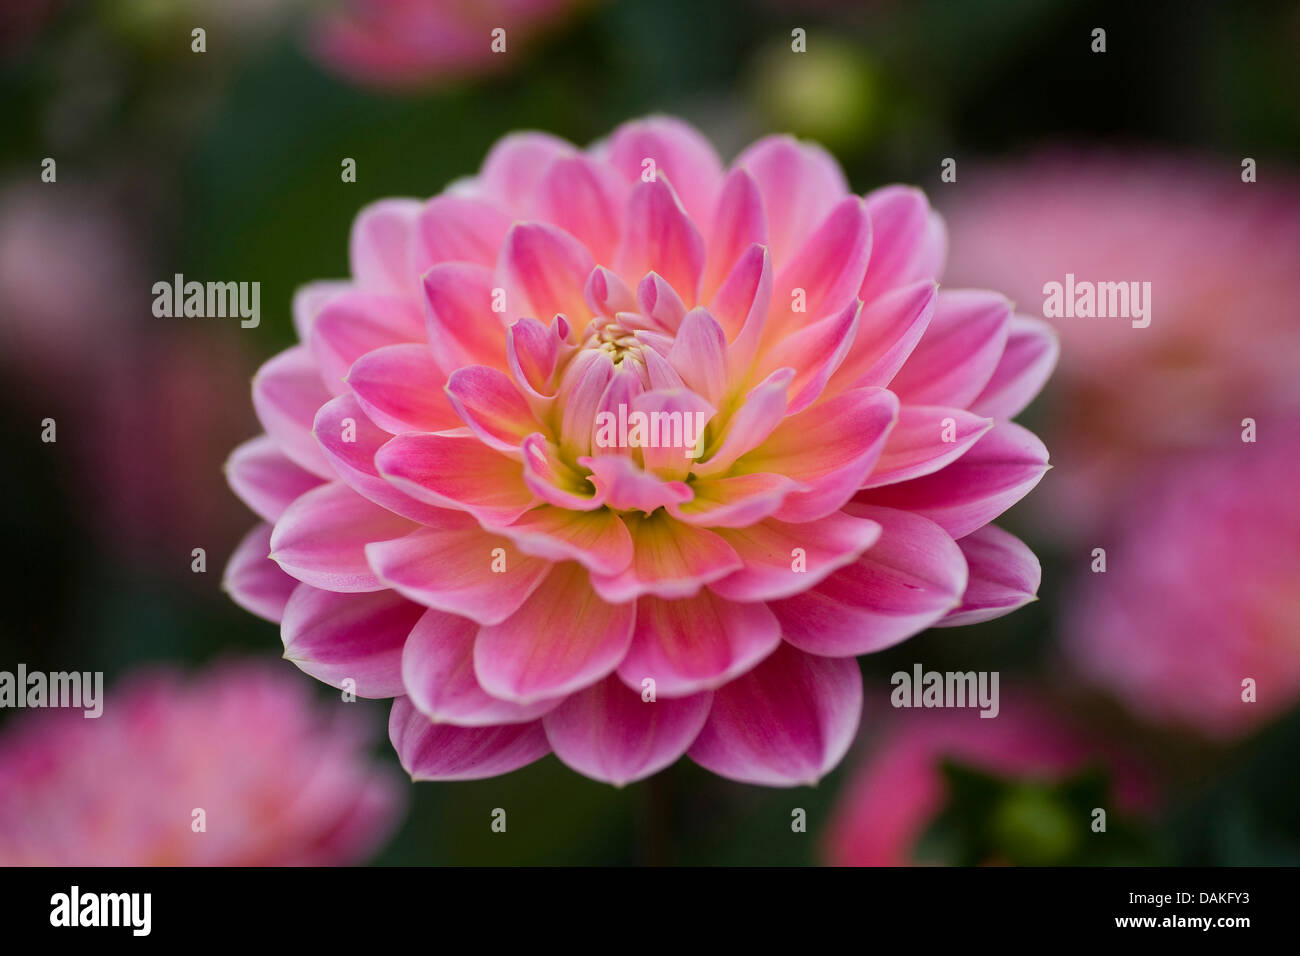 georgina (Dahlia 'Hapet Elite', Dahlia Hapet Elite), cultivar Hapet Elite - Stock Image